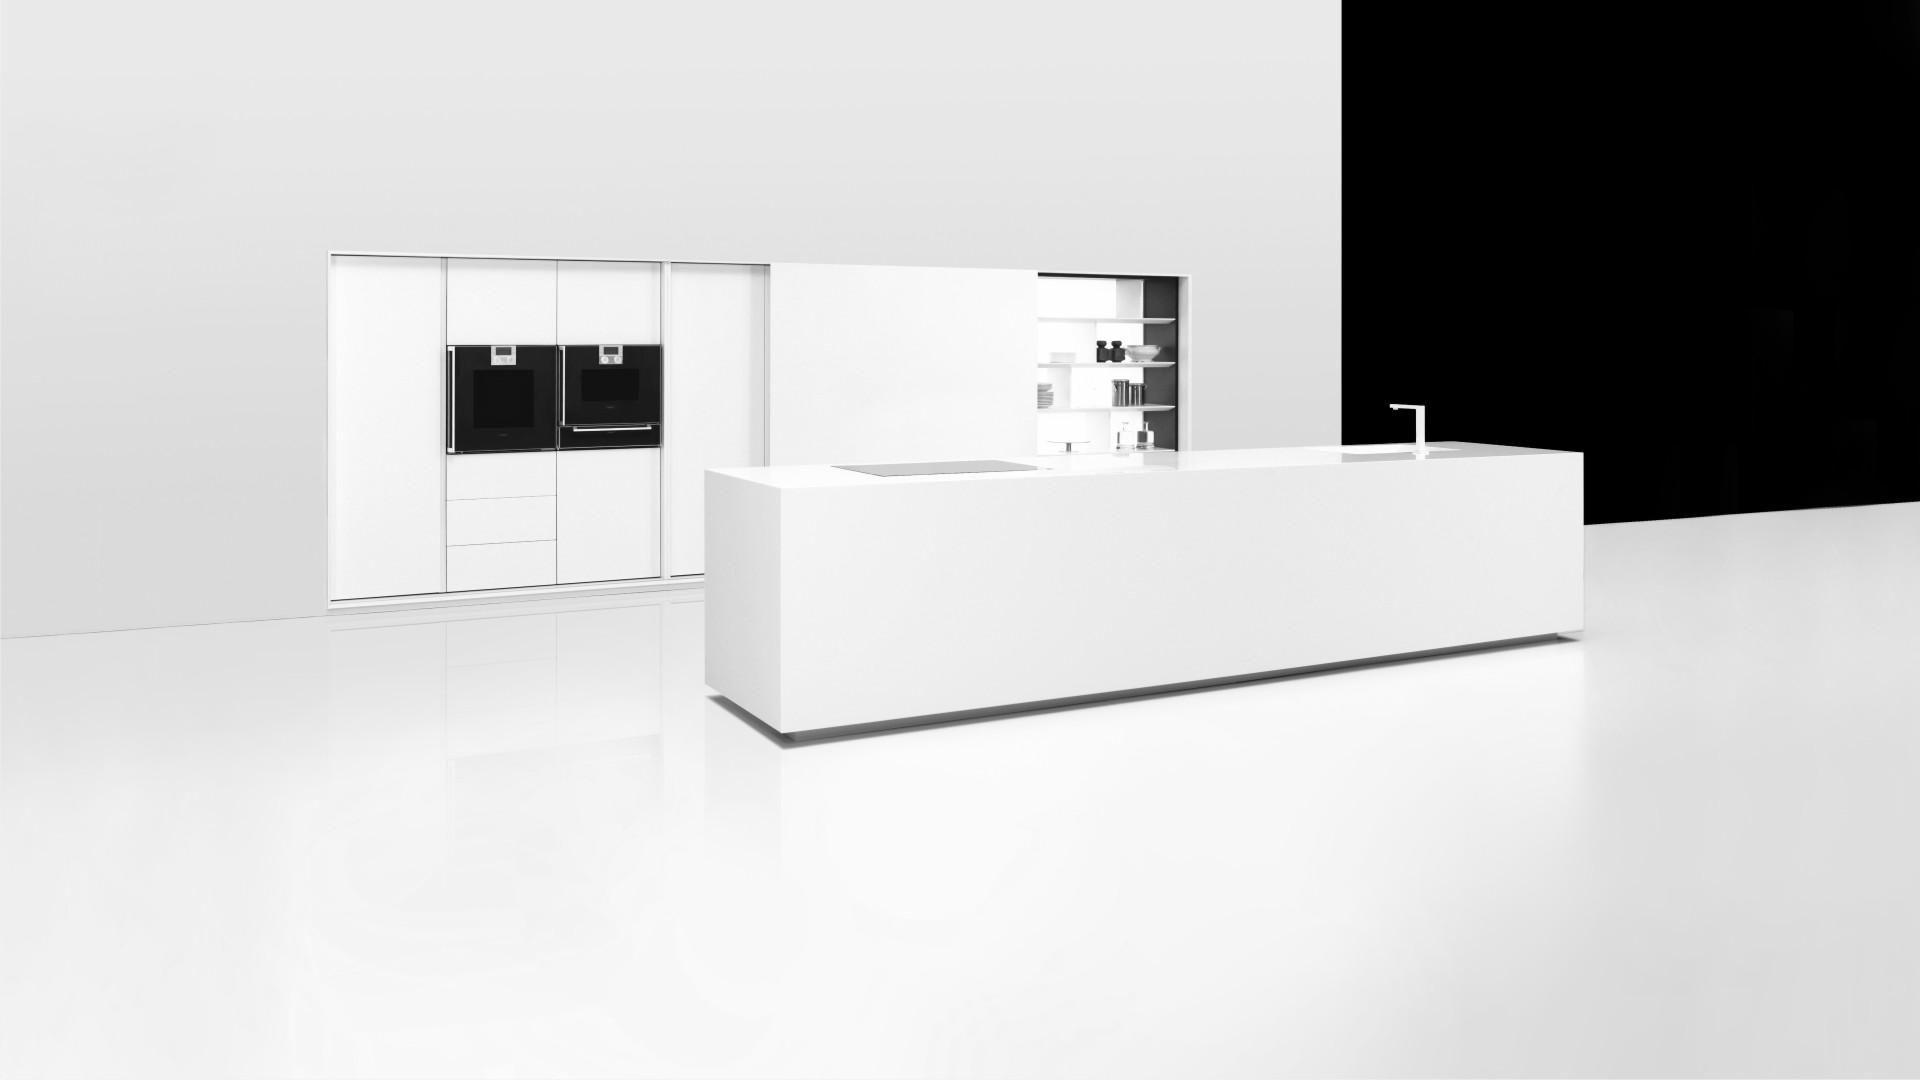 Design Cube Keuken : Nuuun cube designer eiland keuken wow home invasion